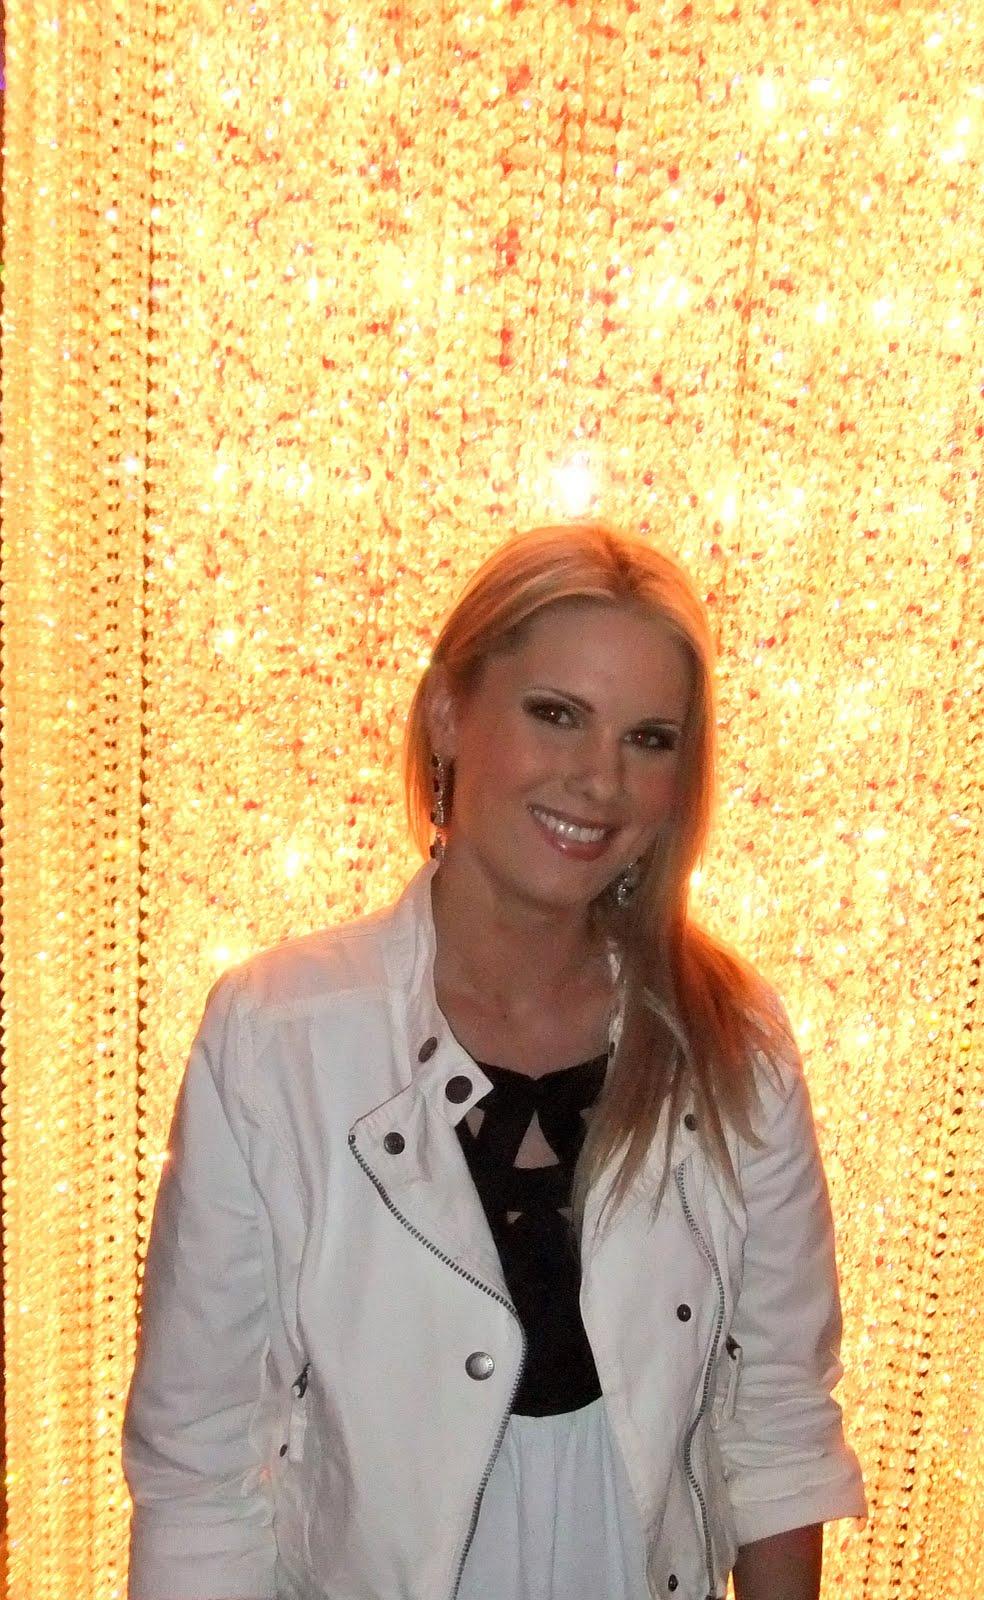 Heather Marie Mallary-Orchard: July 2010